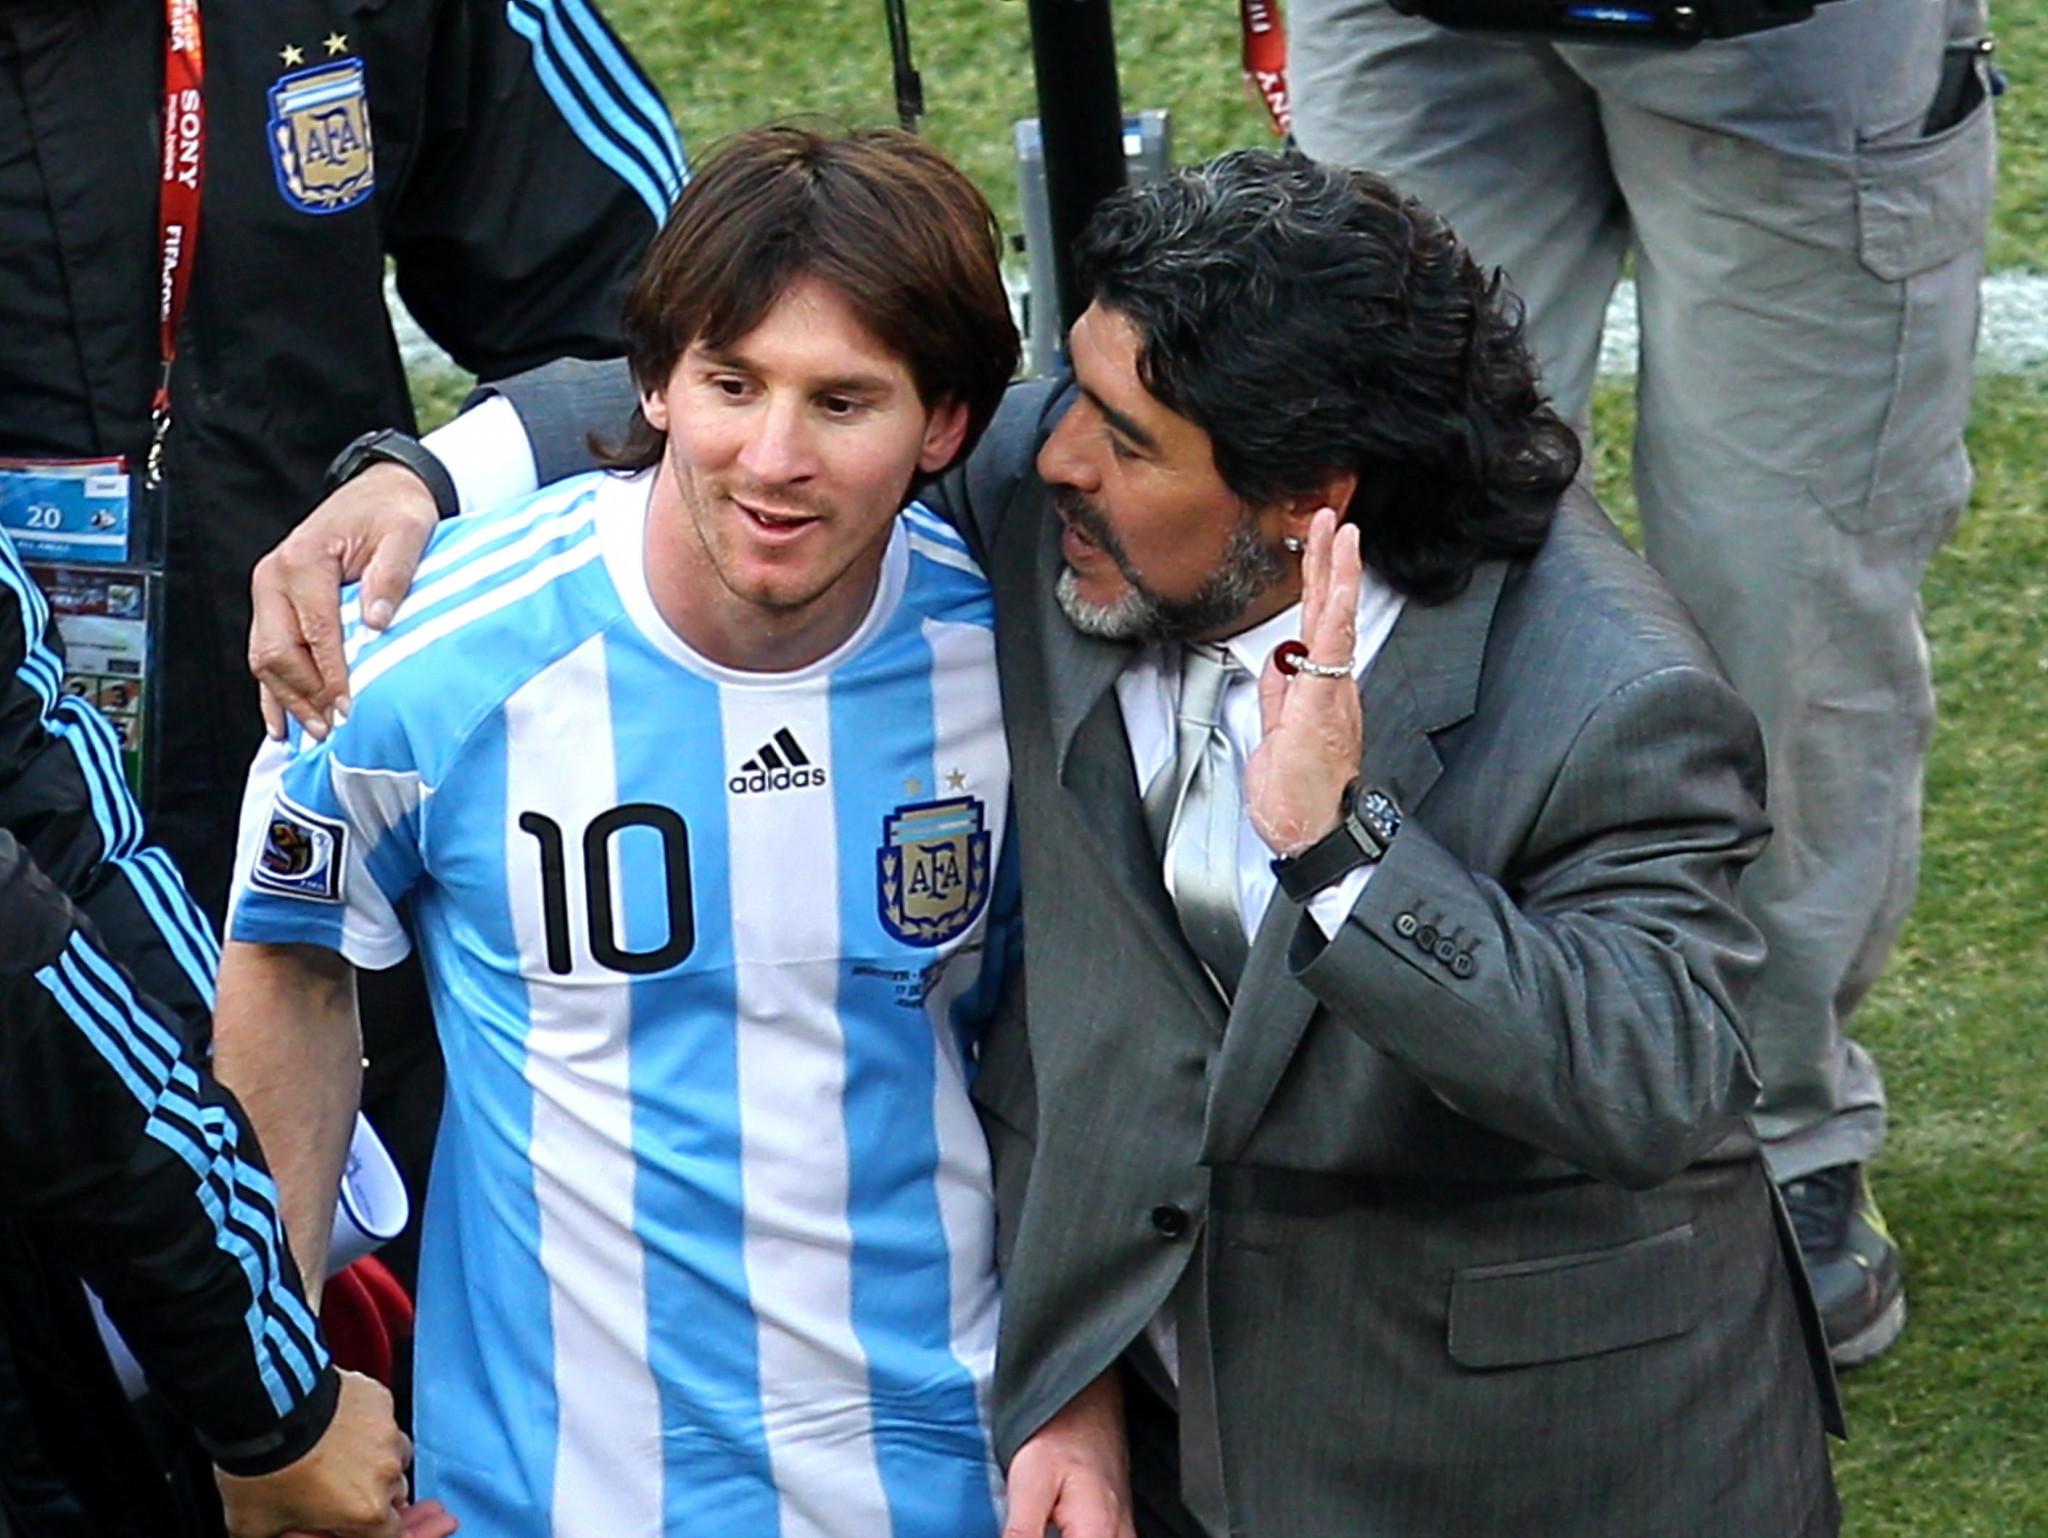 Lionel Messi today said Diego Maradona is